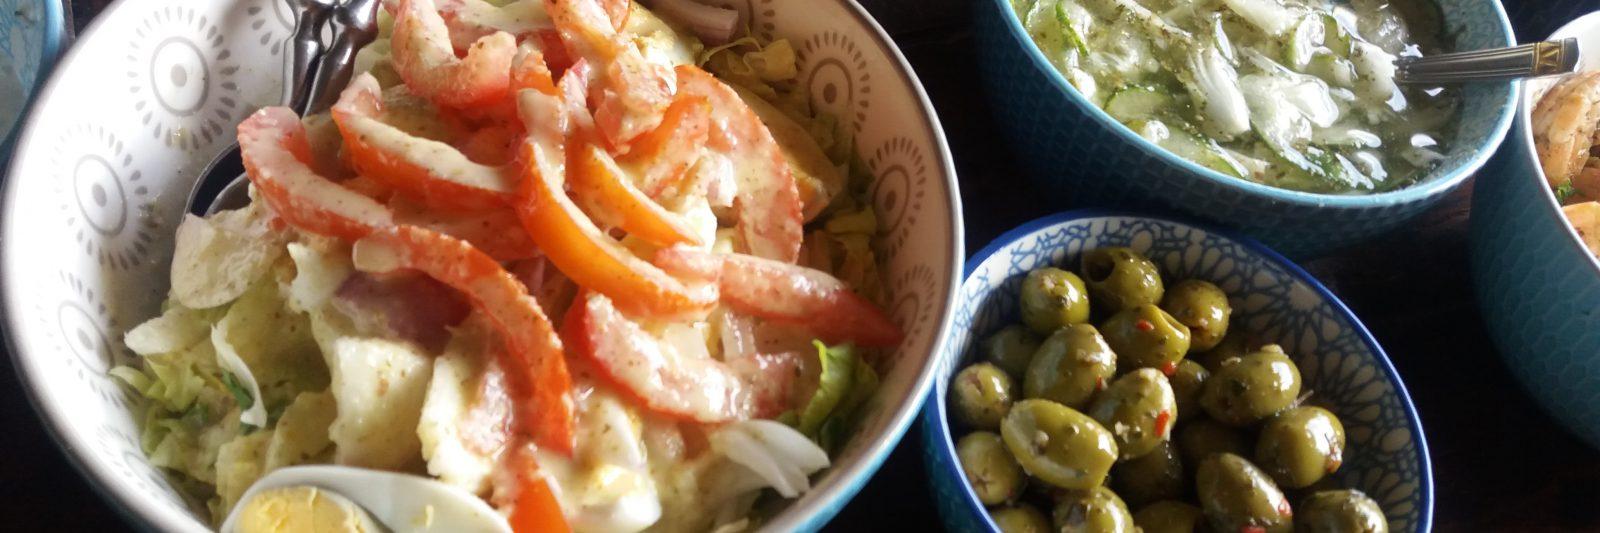 soulfood vegan vegetarian cooking dinner